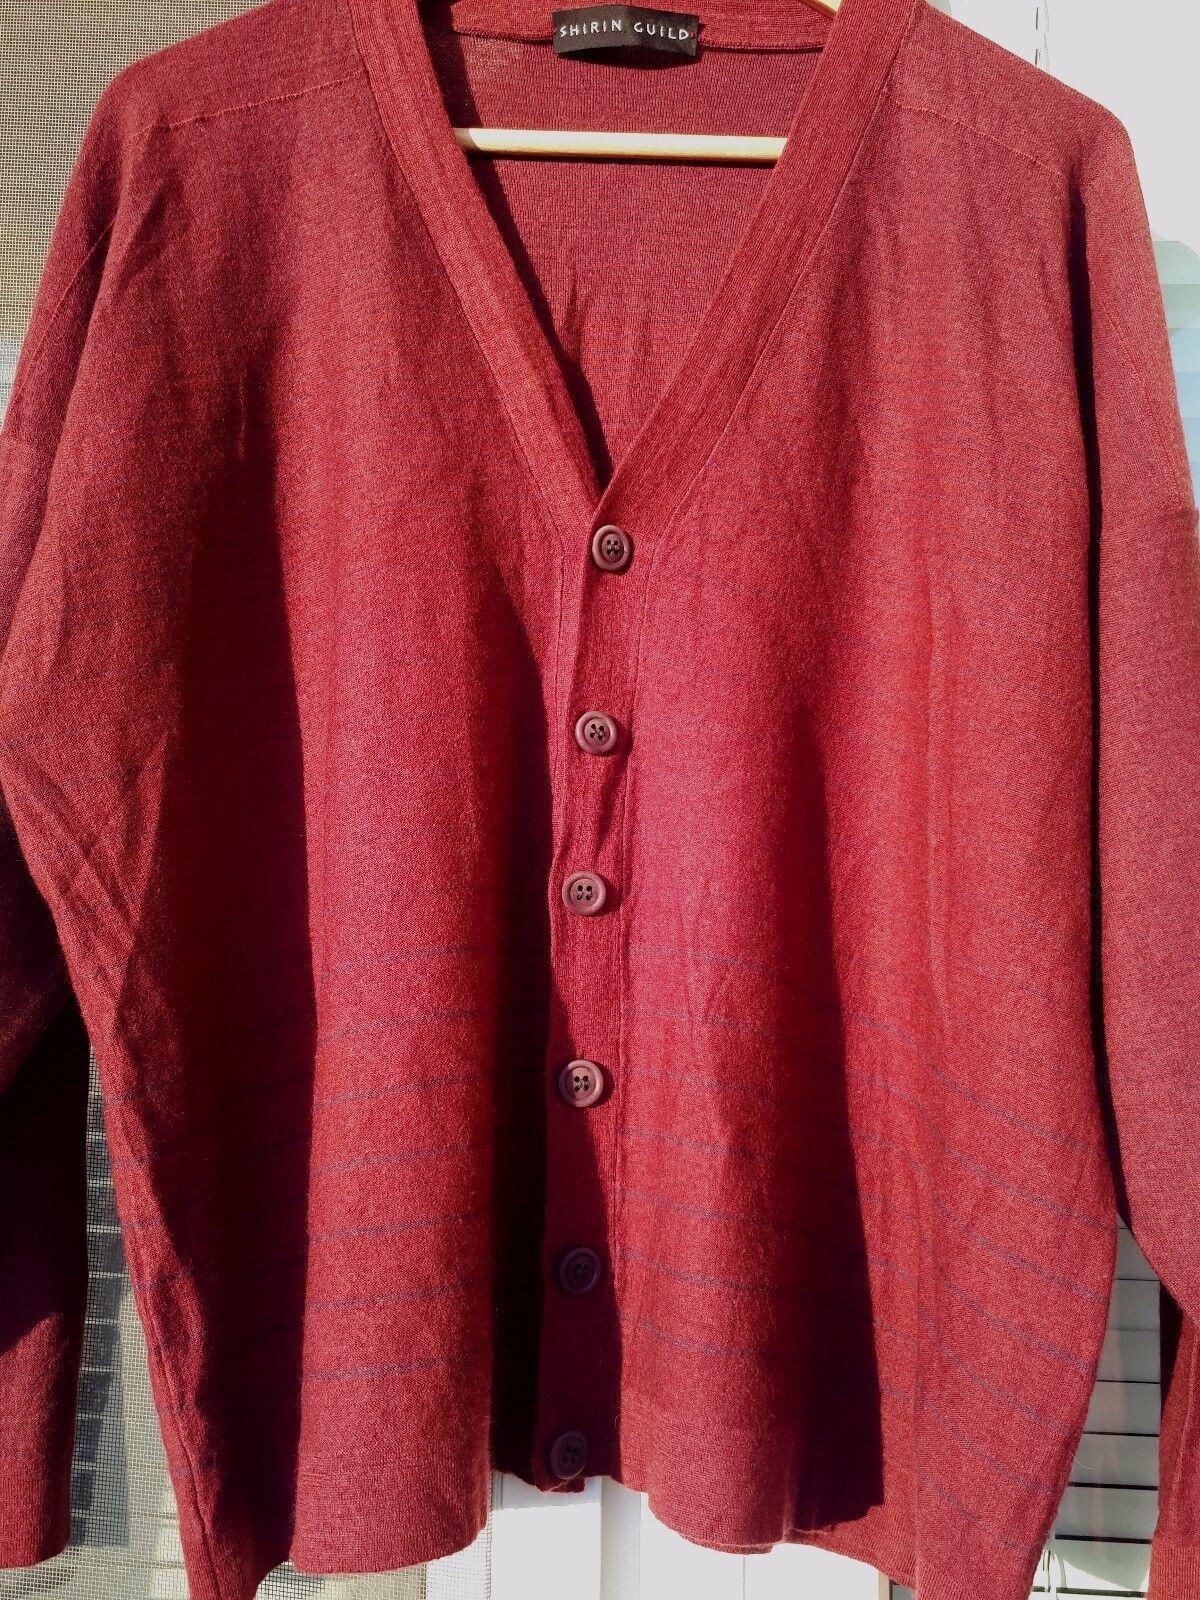 Shirin Guild Tricot Veste Pull Pull 100% Merino Superfine Scotland Laine Wool